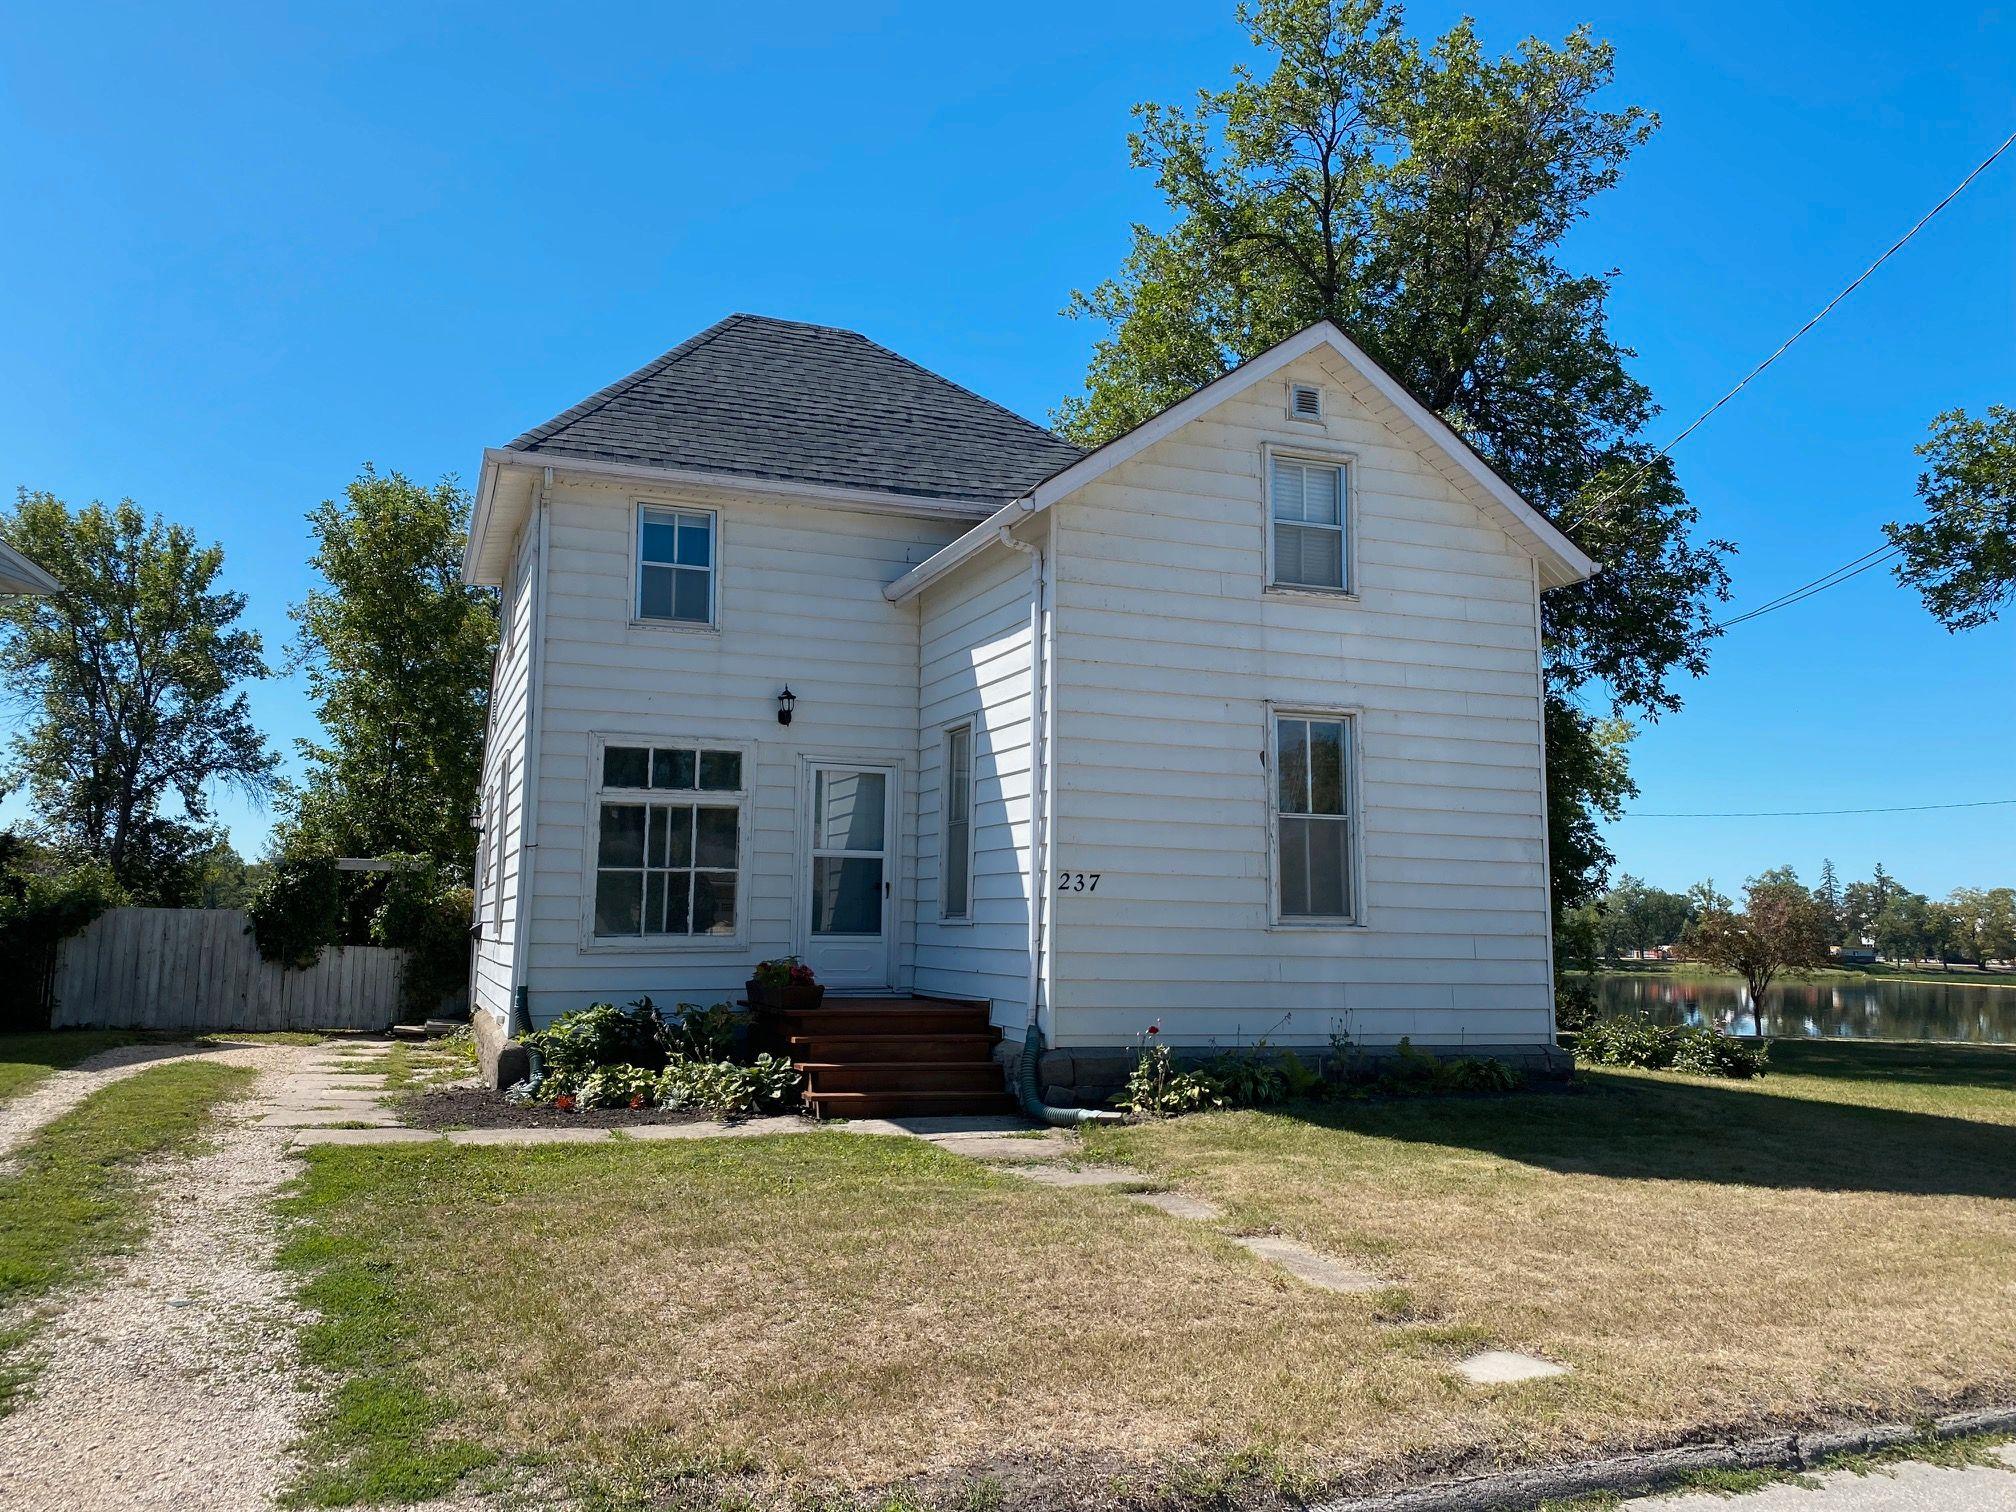 Main Photo: 237 Portage Avenue in Portage la Prairie: House for sale : MLS®# 202120515